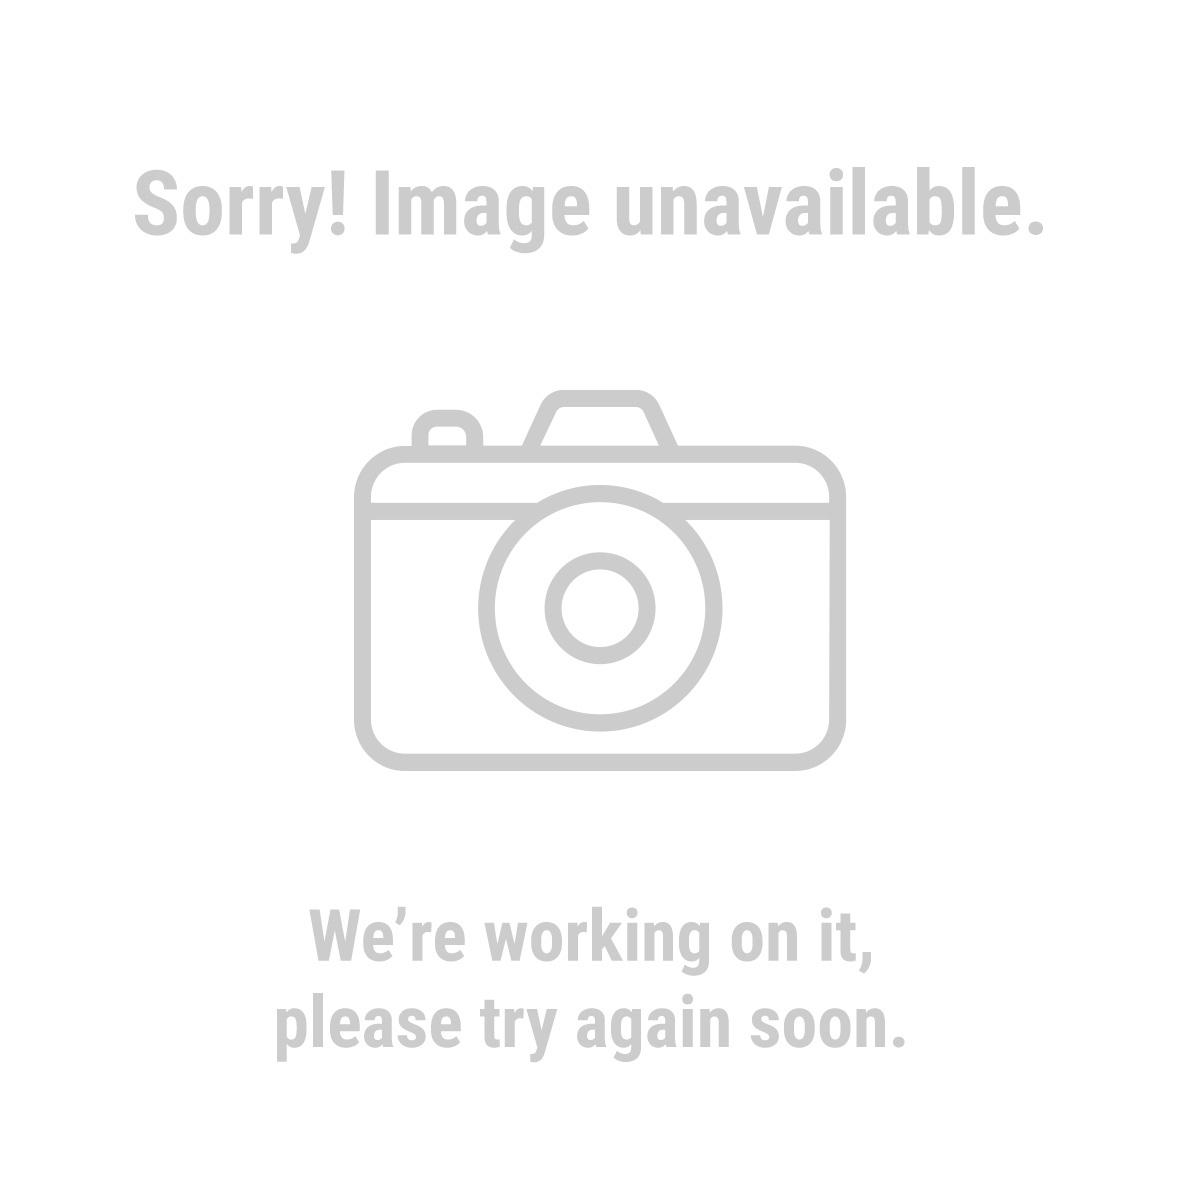 Predator Engines 69727 6.5 HP (212cc) OHV Horizontal Shaft Gas Engine EPA/CARB